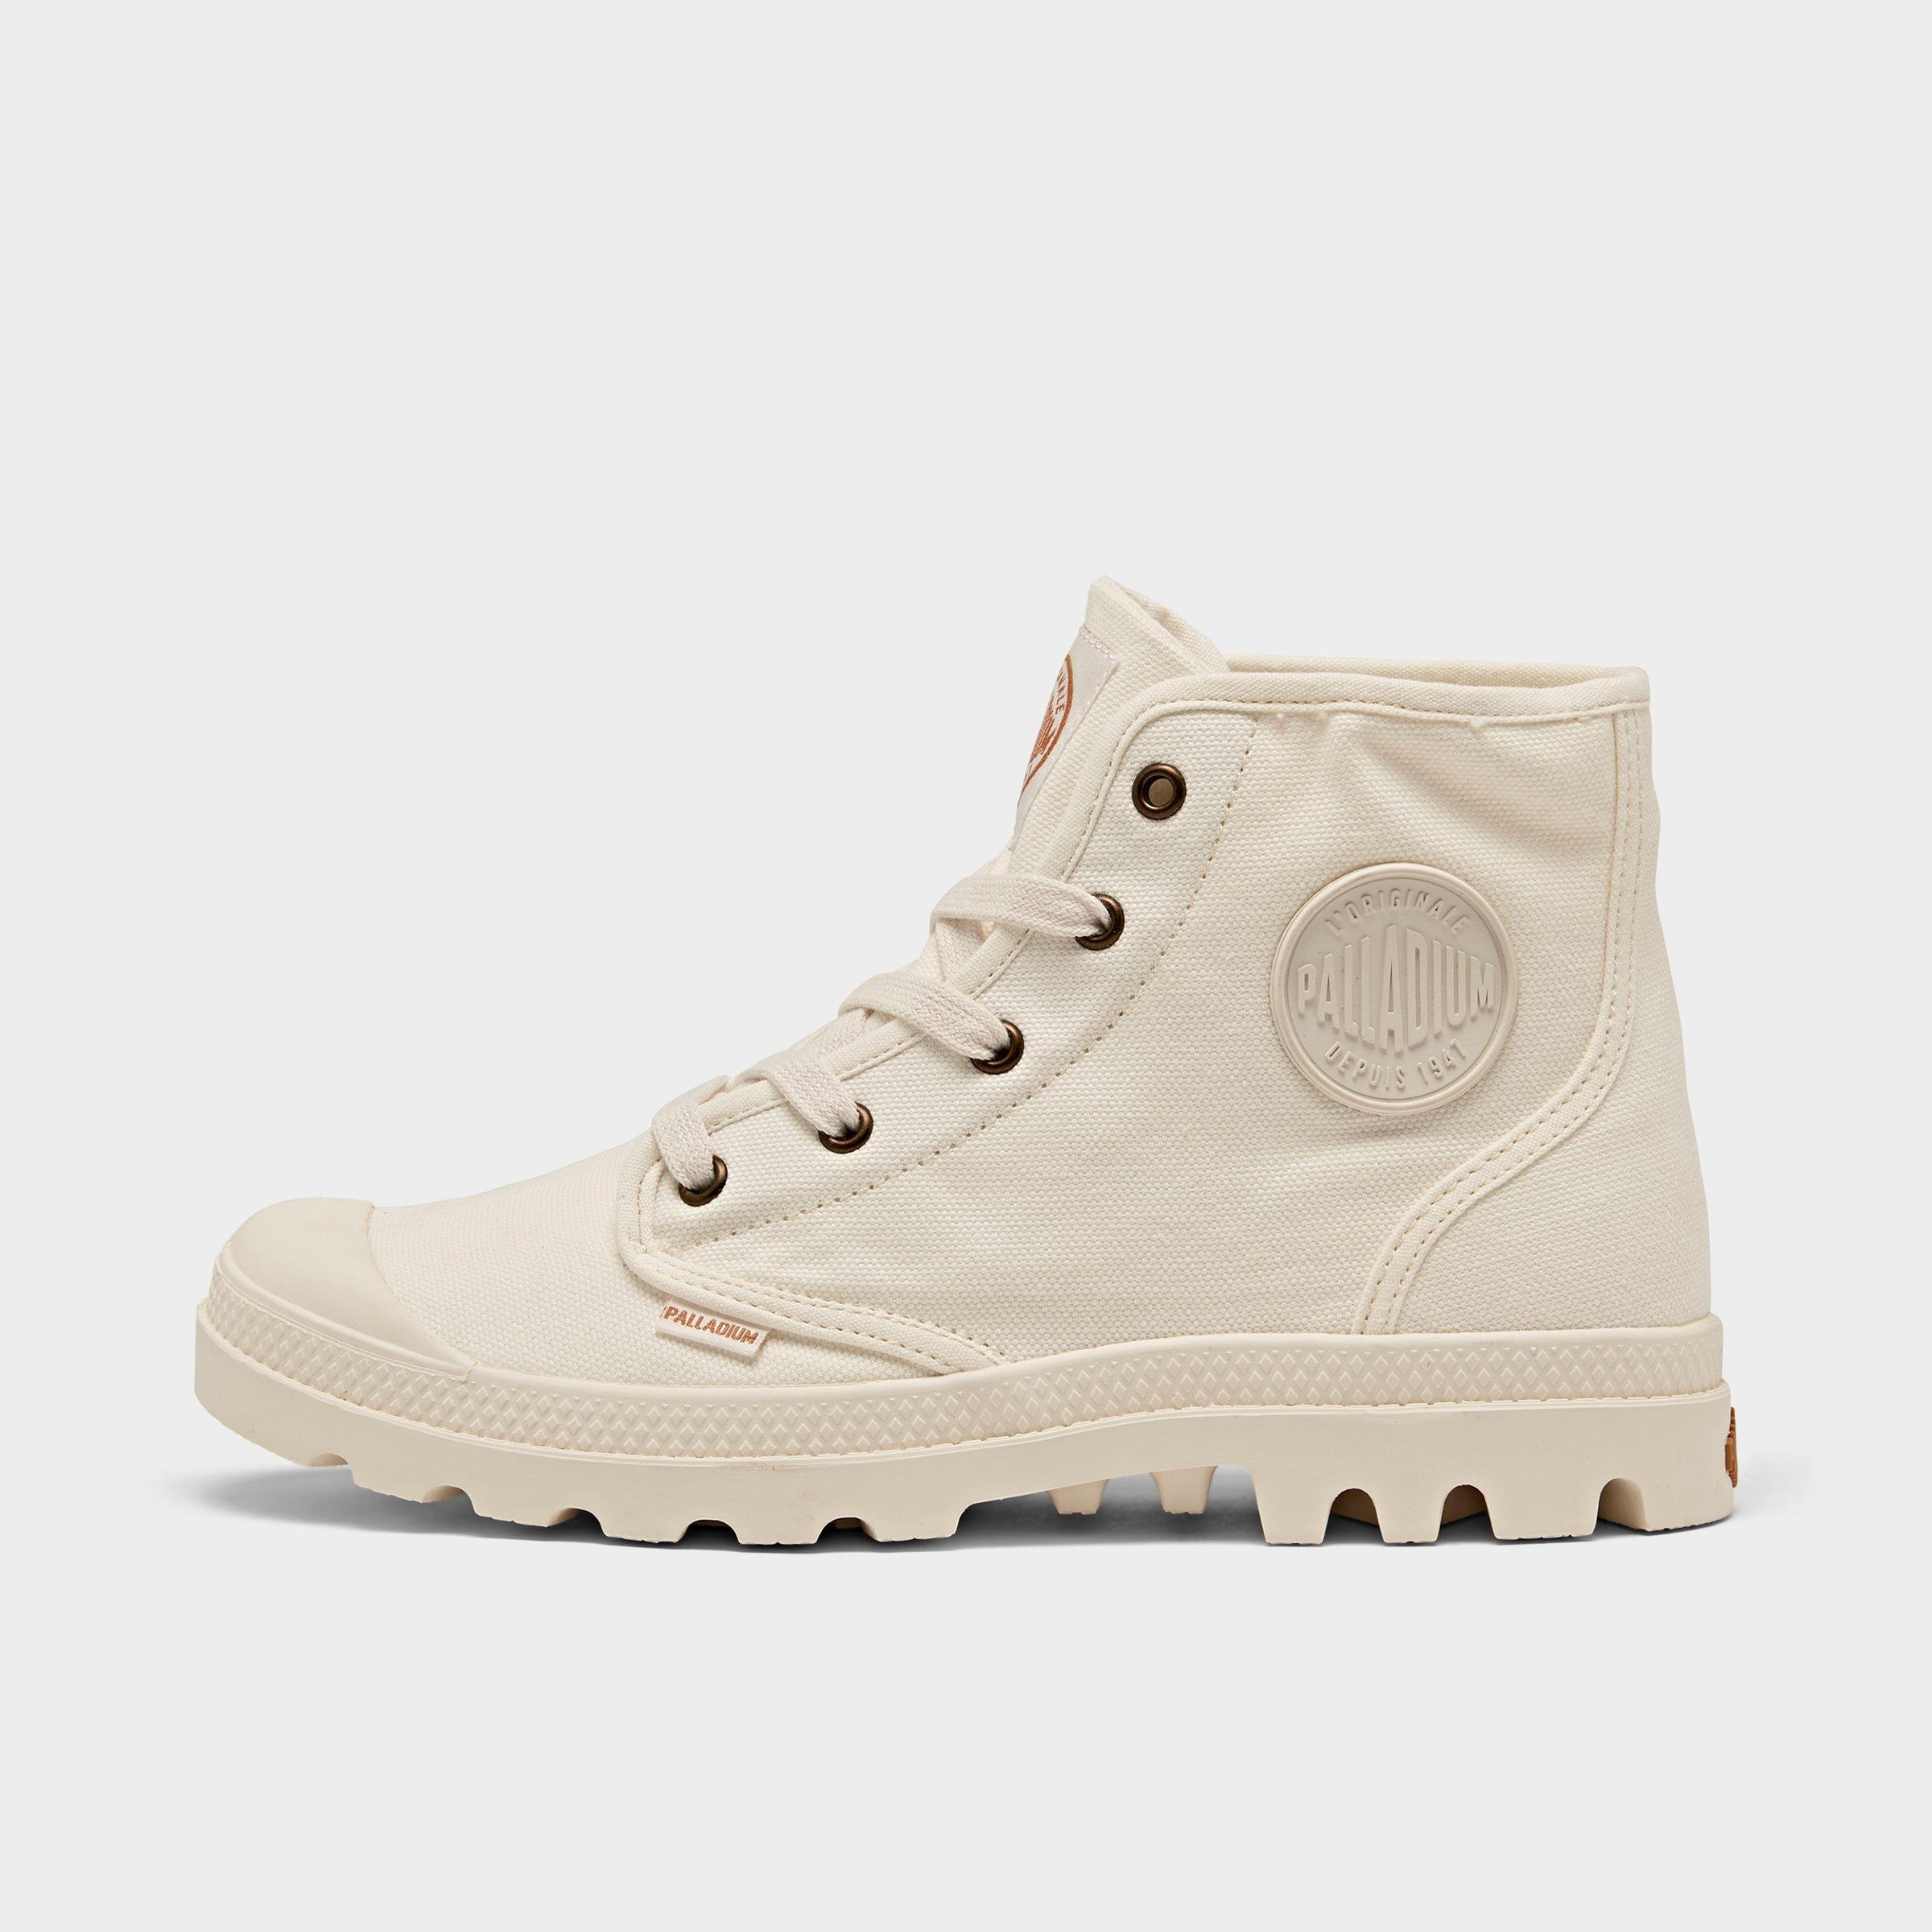 Palladium palladenim Boots Chaussures High Top Loisirs Sneaker Orion Blue 76230-451